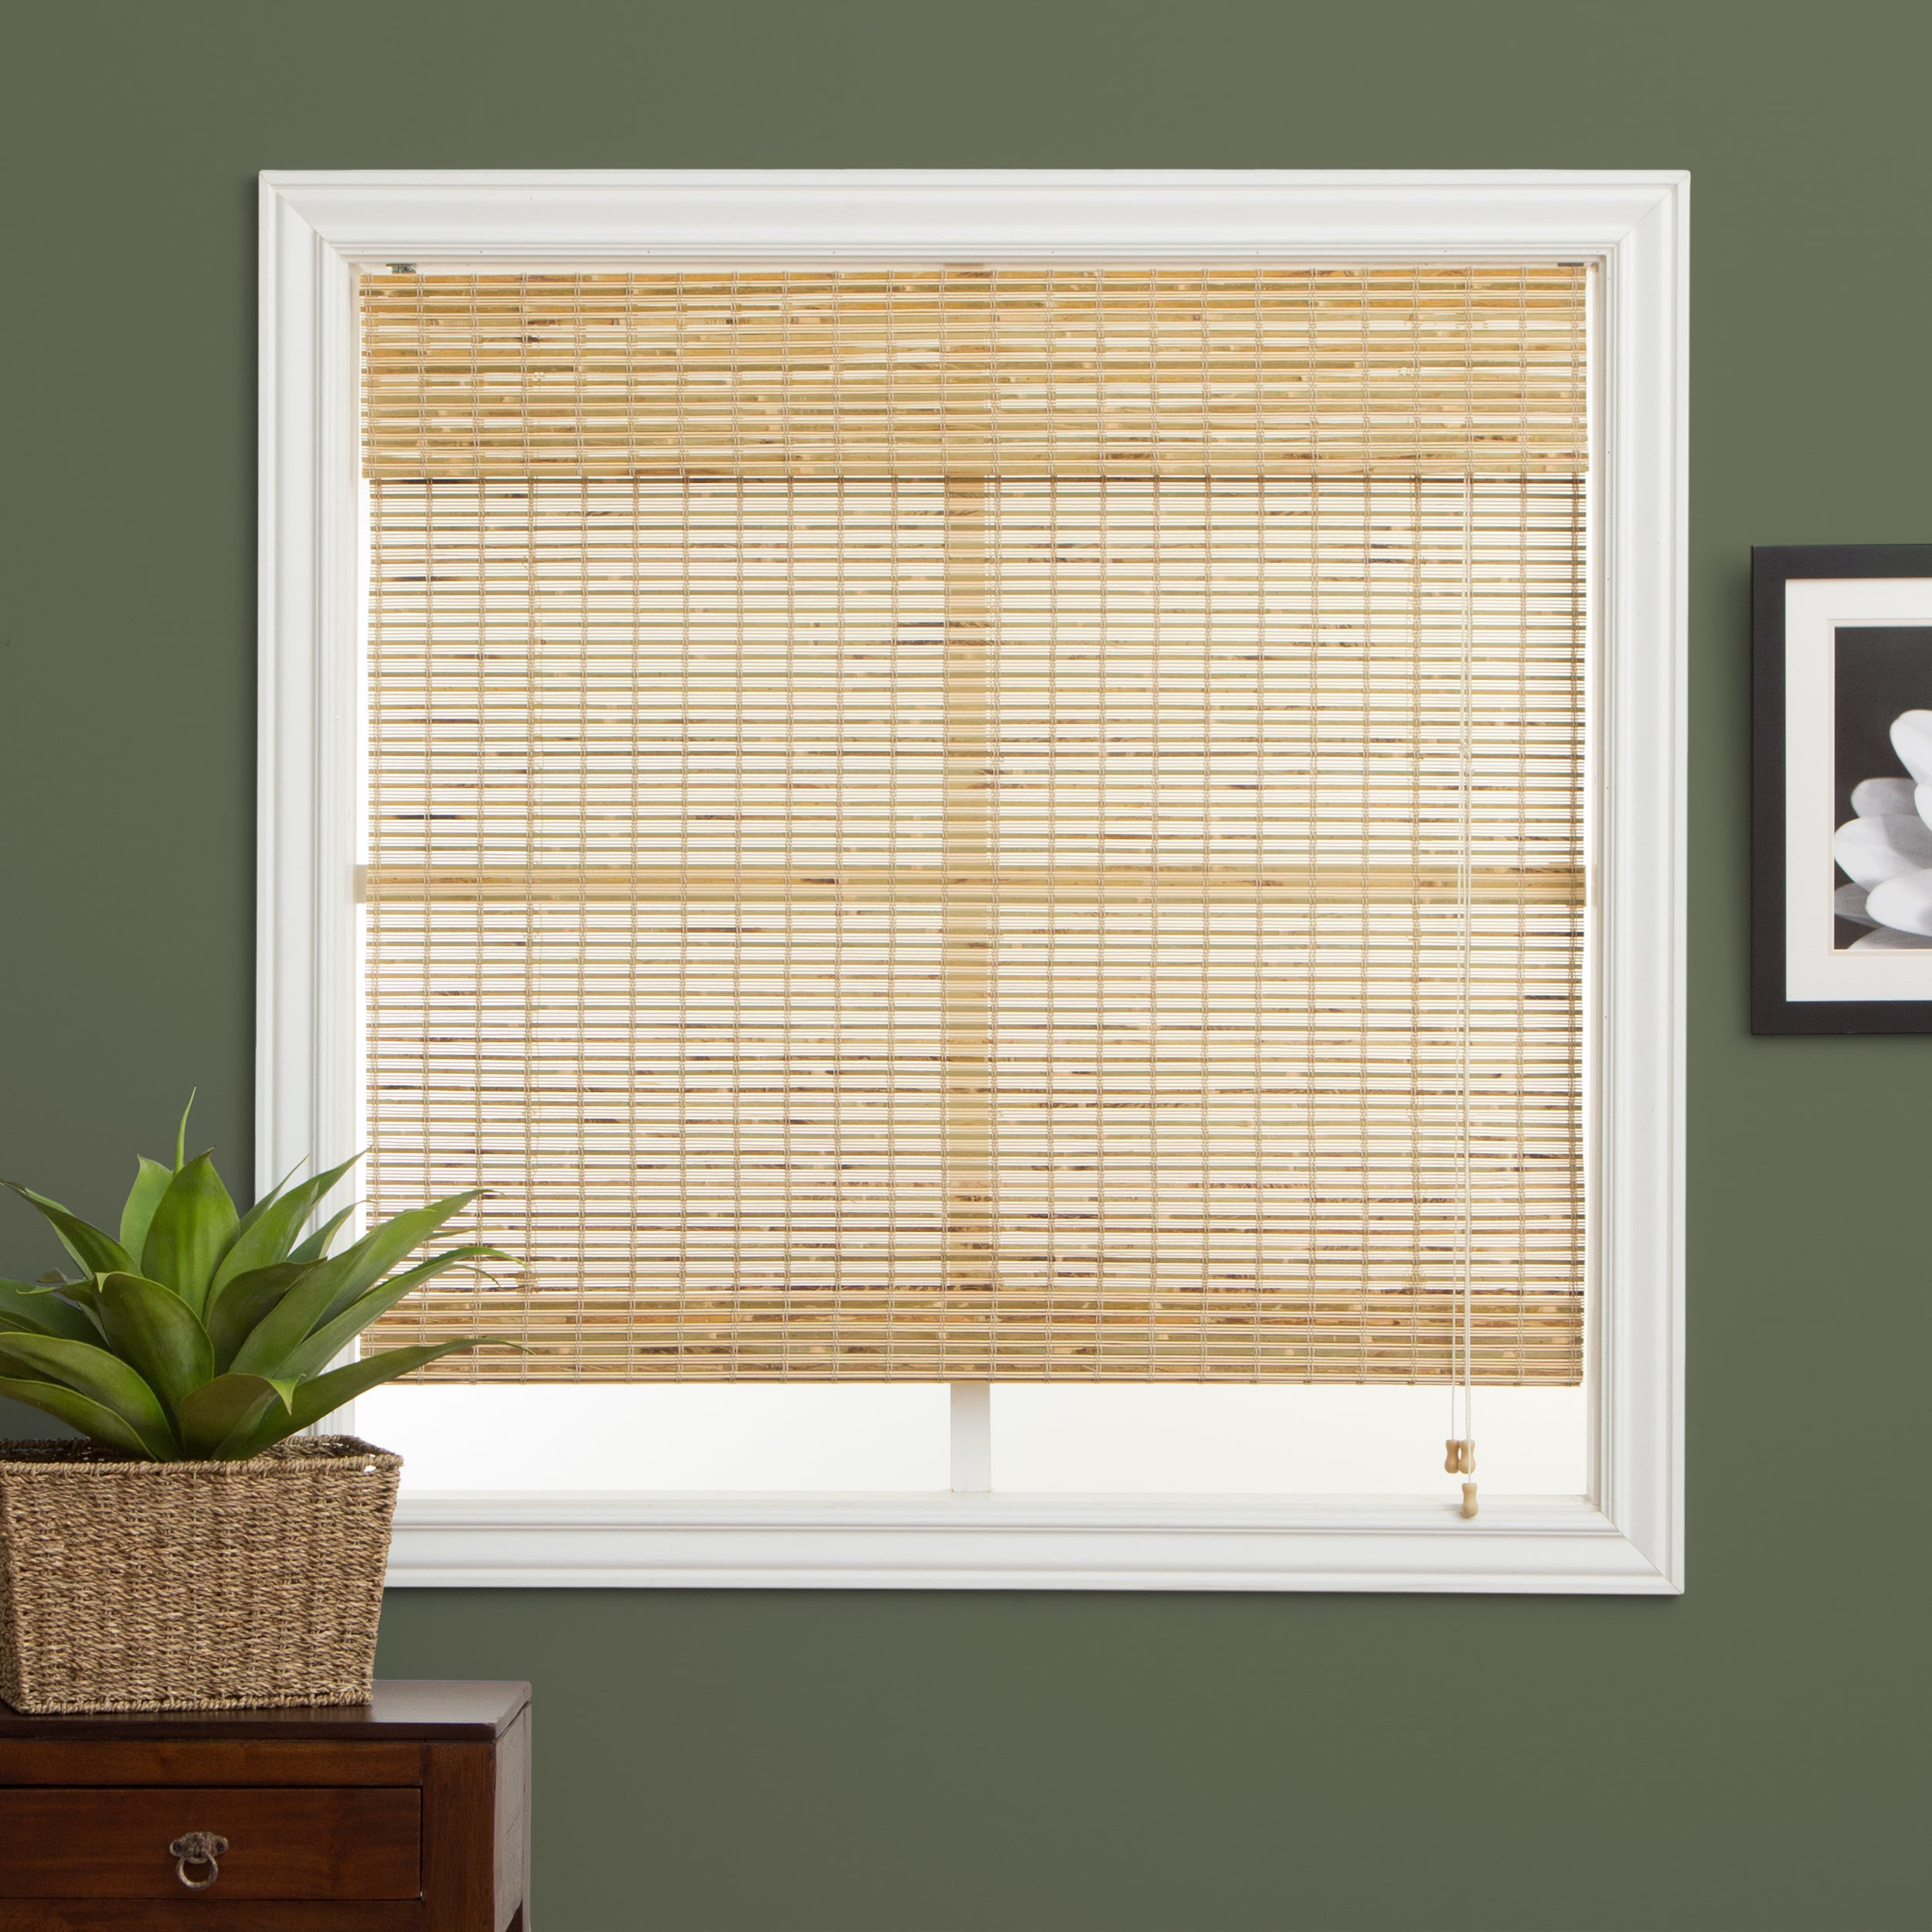 curtain pinterest voile roman with pin ideas valance blind window shade